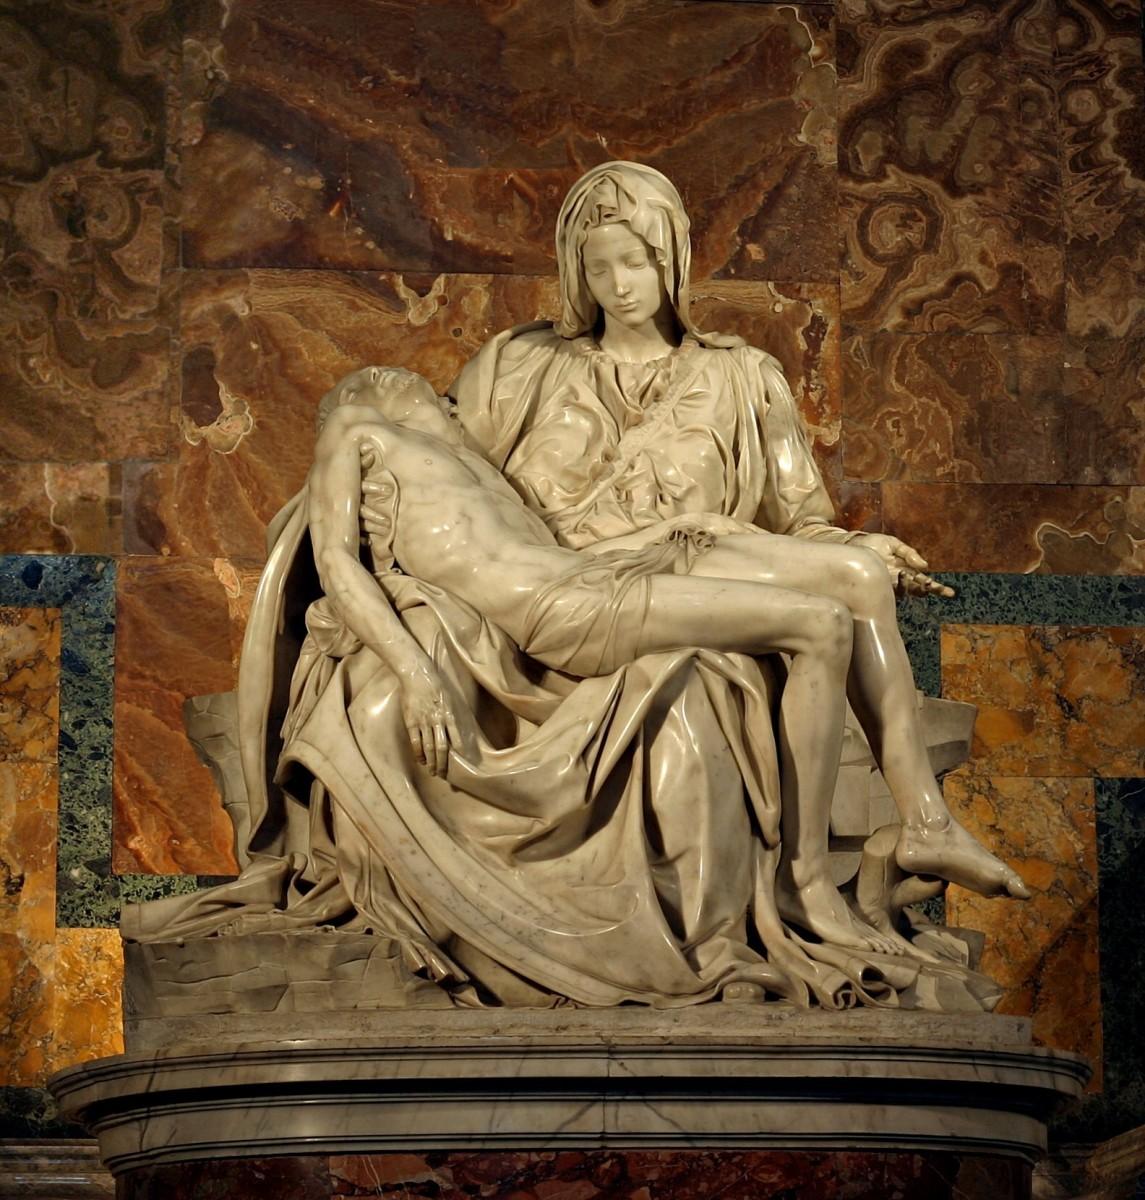 Tenebrae - Three Crosses - Celebrating Easter Week - Michelangelo's Pieta and Much More